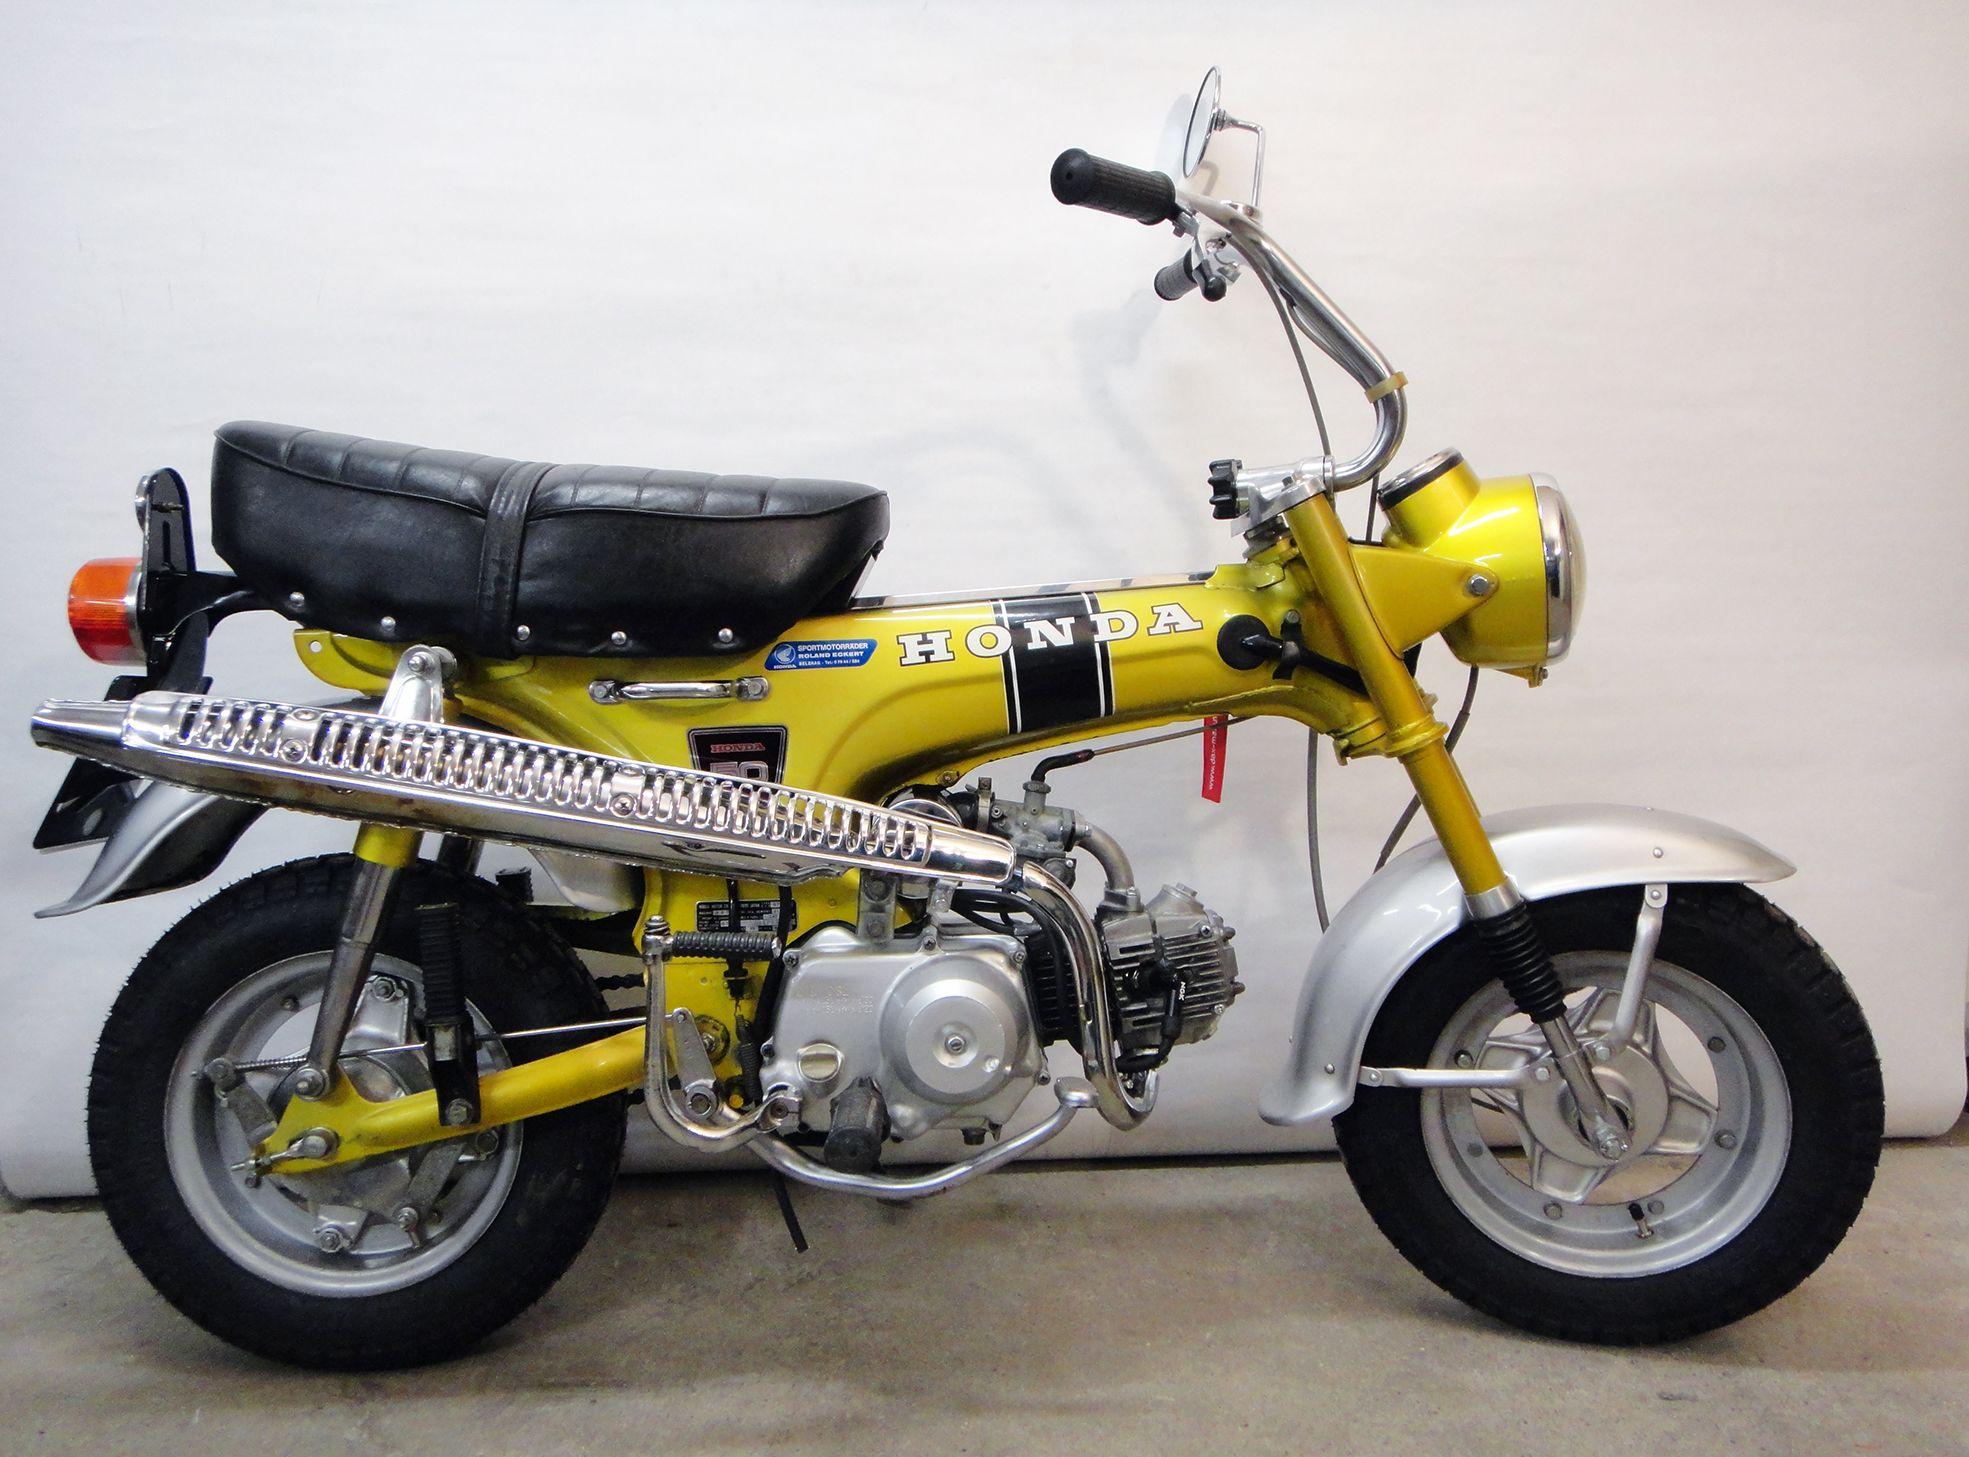 honda dax st 50 g im erstlack candy yellow special zu verkaufen 2 wheels pinterest. Black Bedroom Furniture Sets. Home Design Ideas